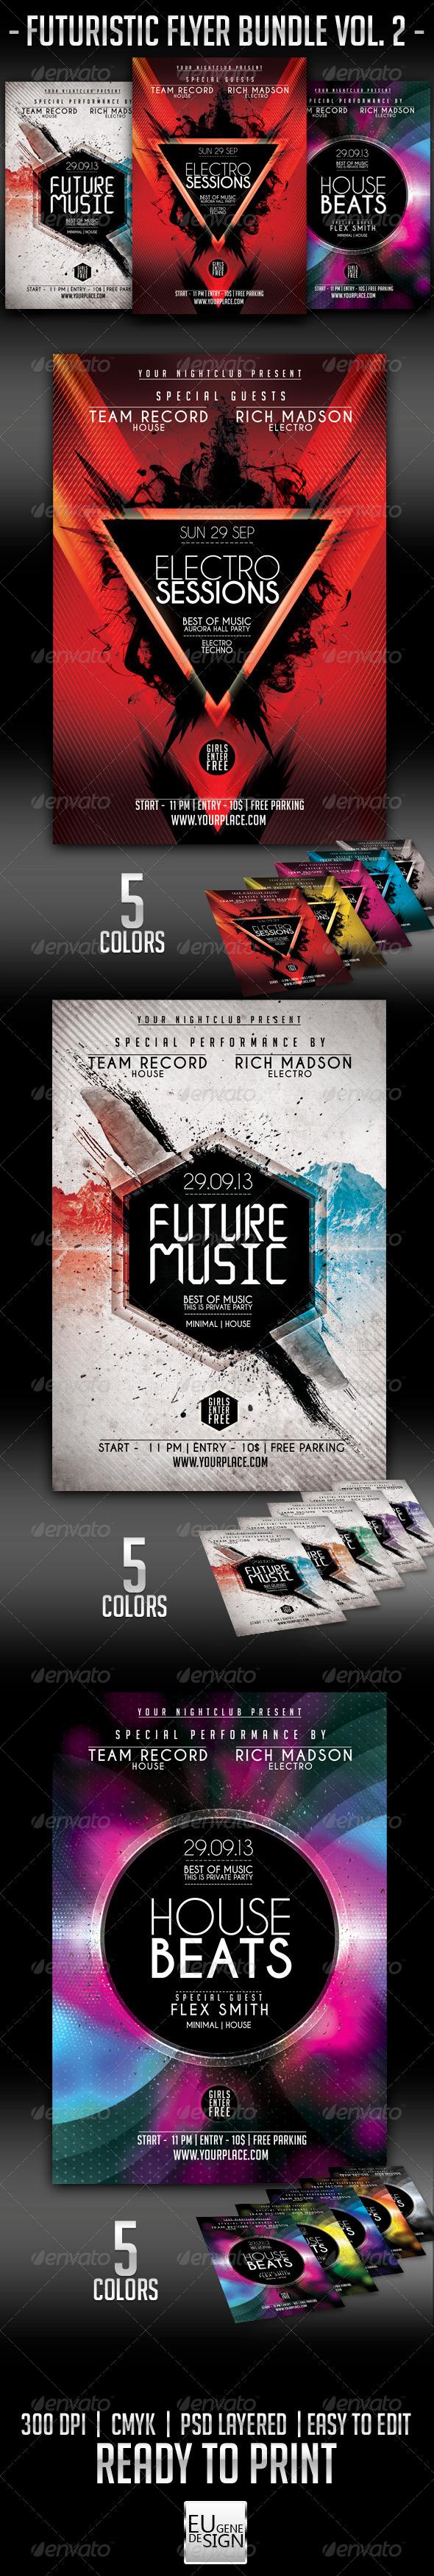 GraphicRiver Futuristic Flyer Bundle Vol 2 5719507